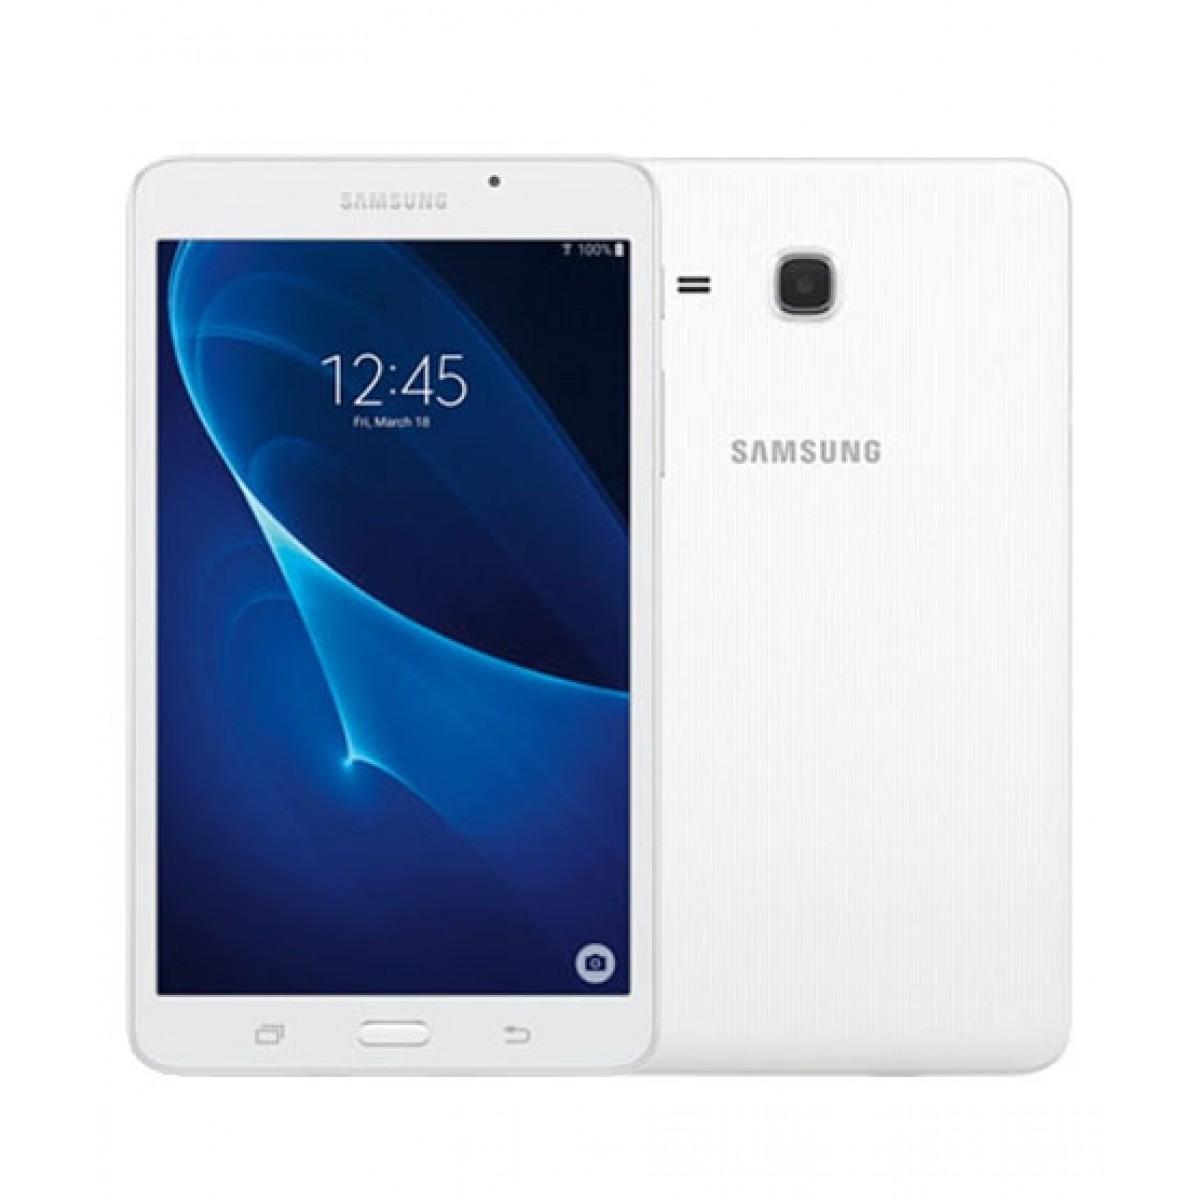 Samsung galaxy tab a series 7.0